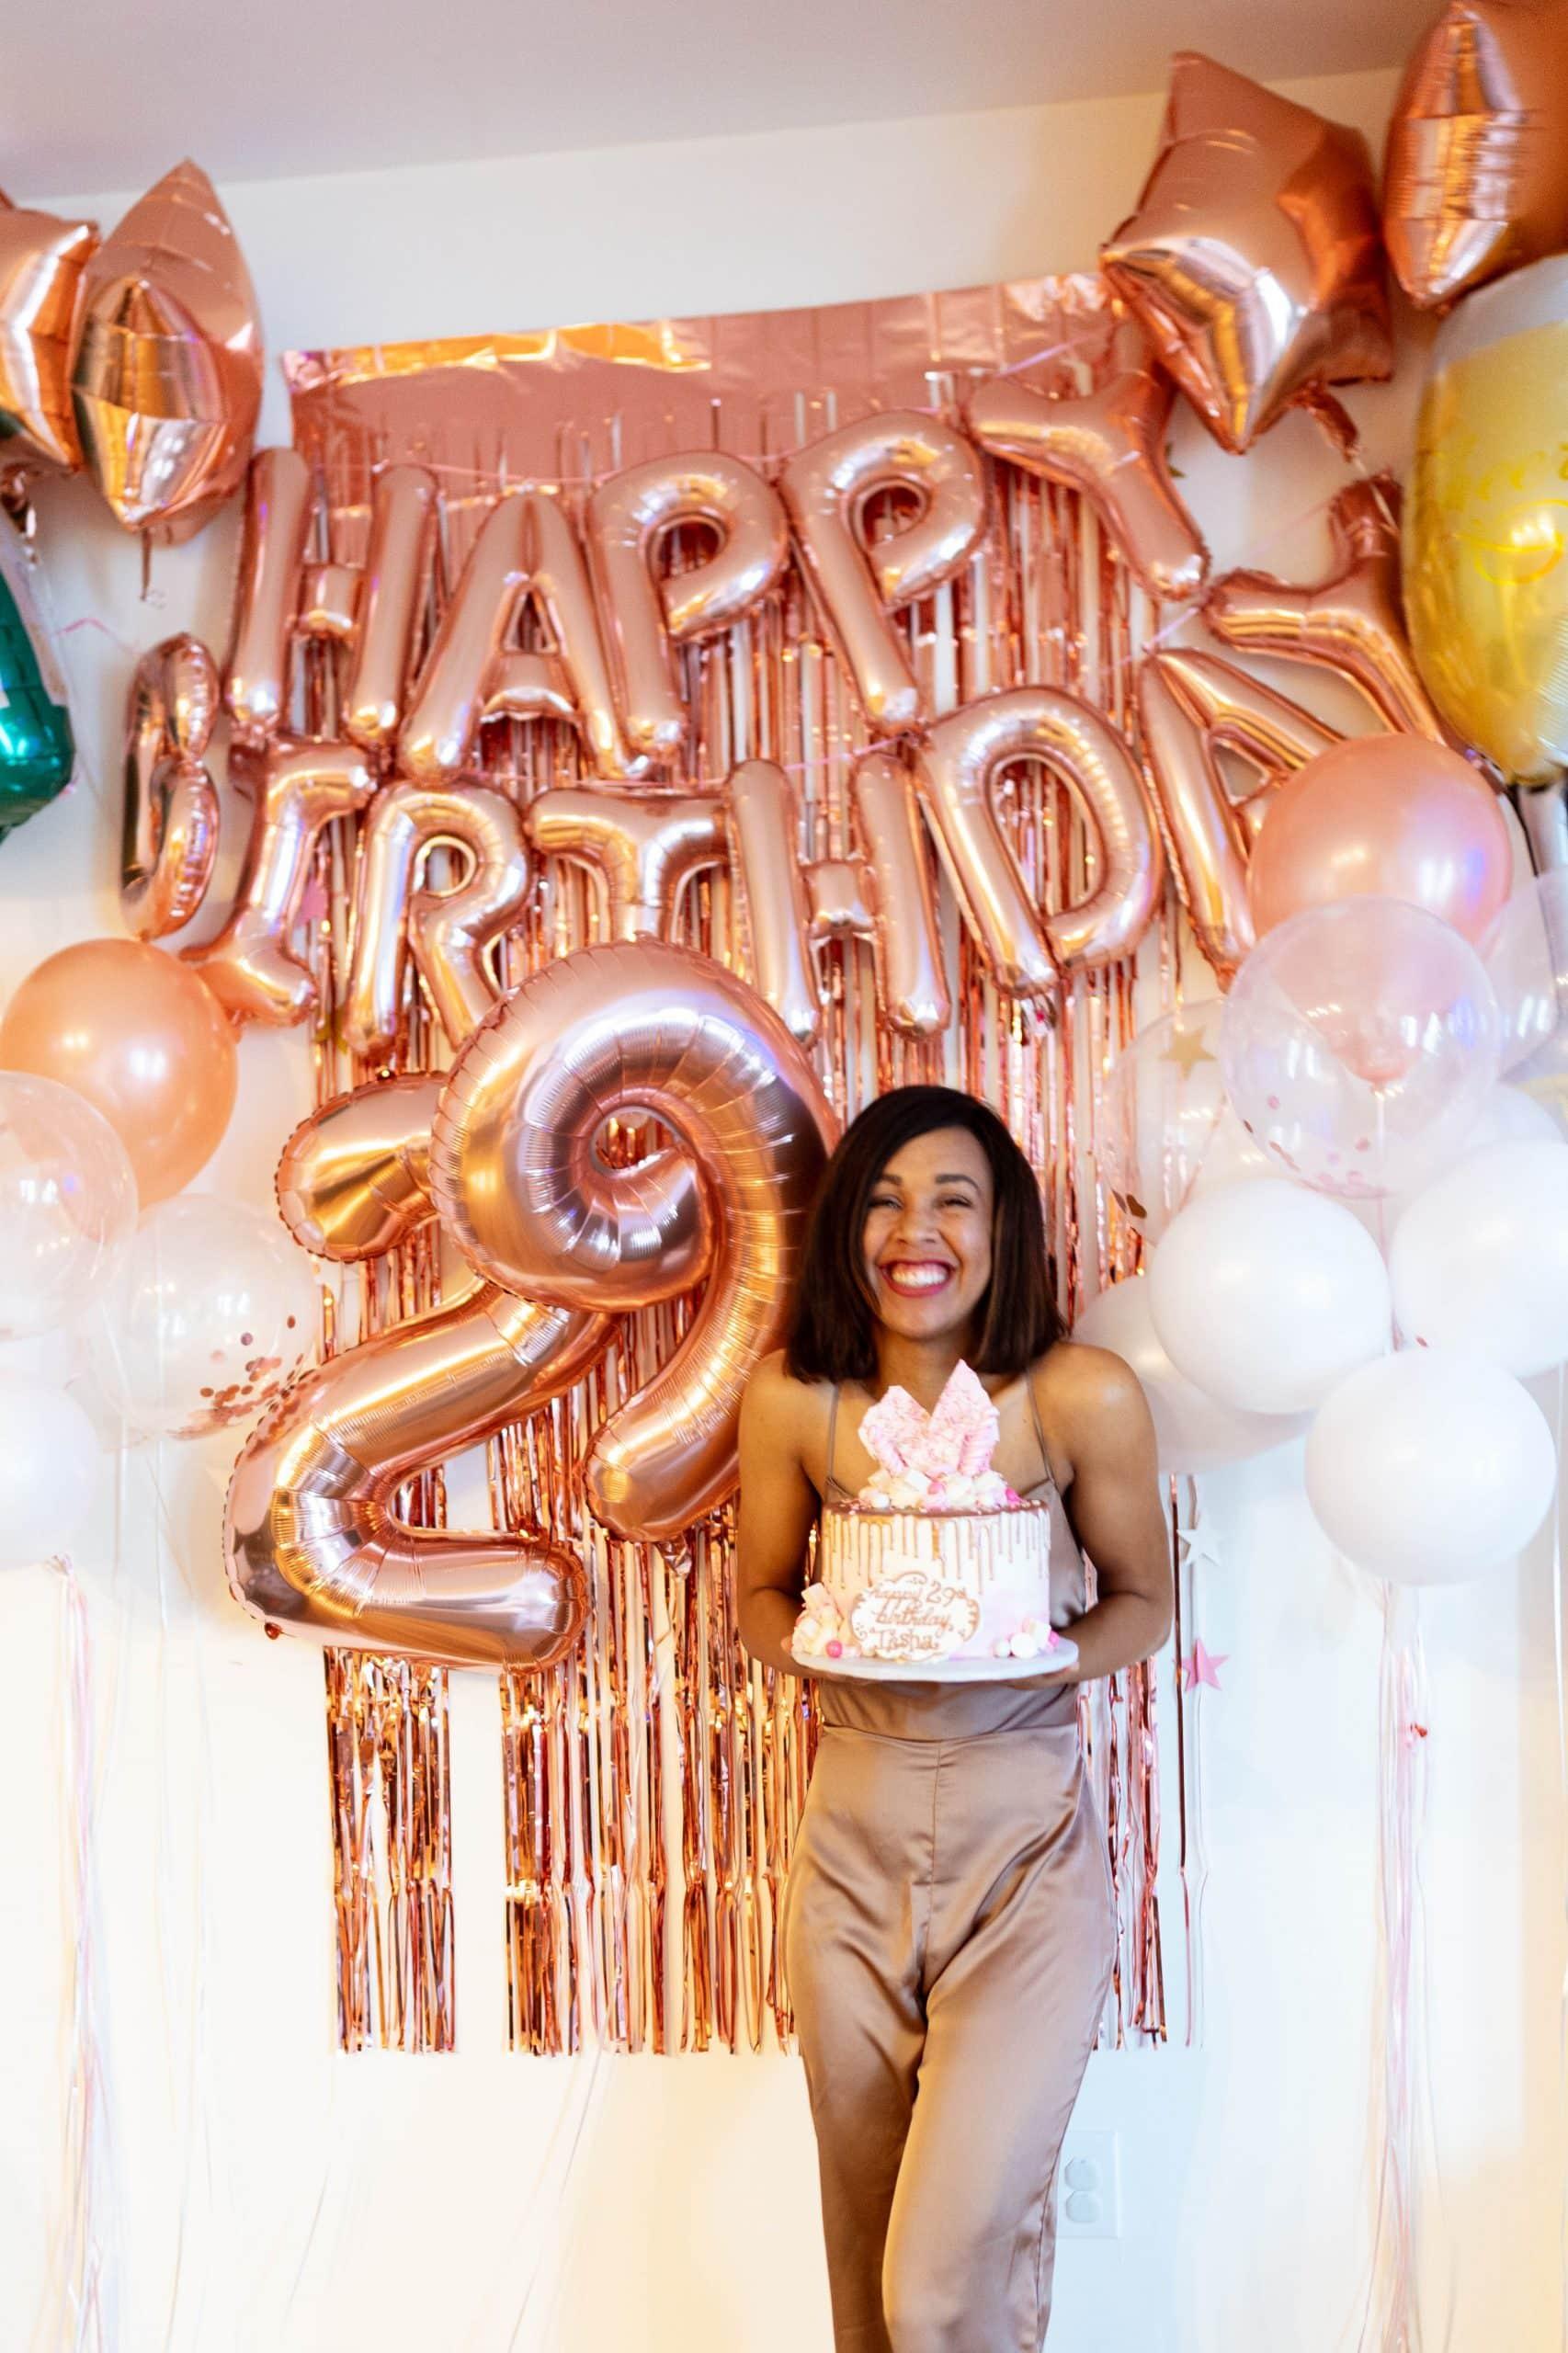 livinglesh celebrating birthday at home